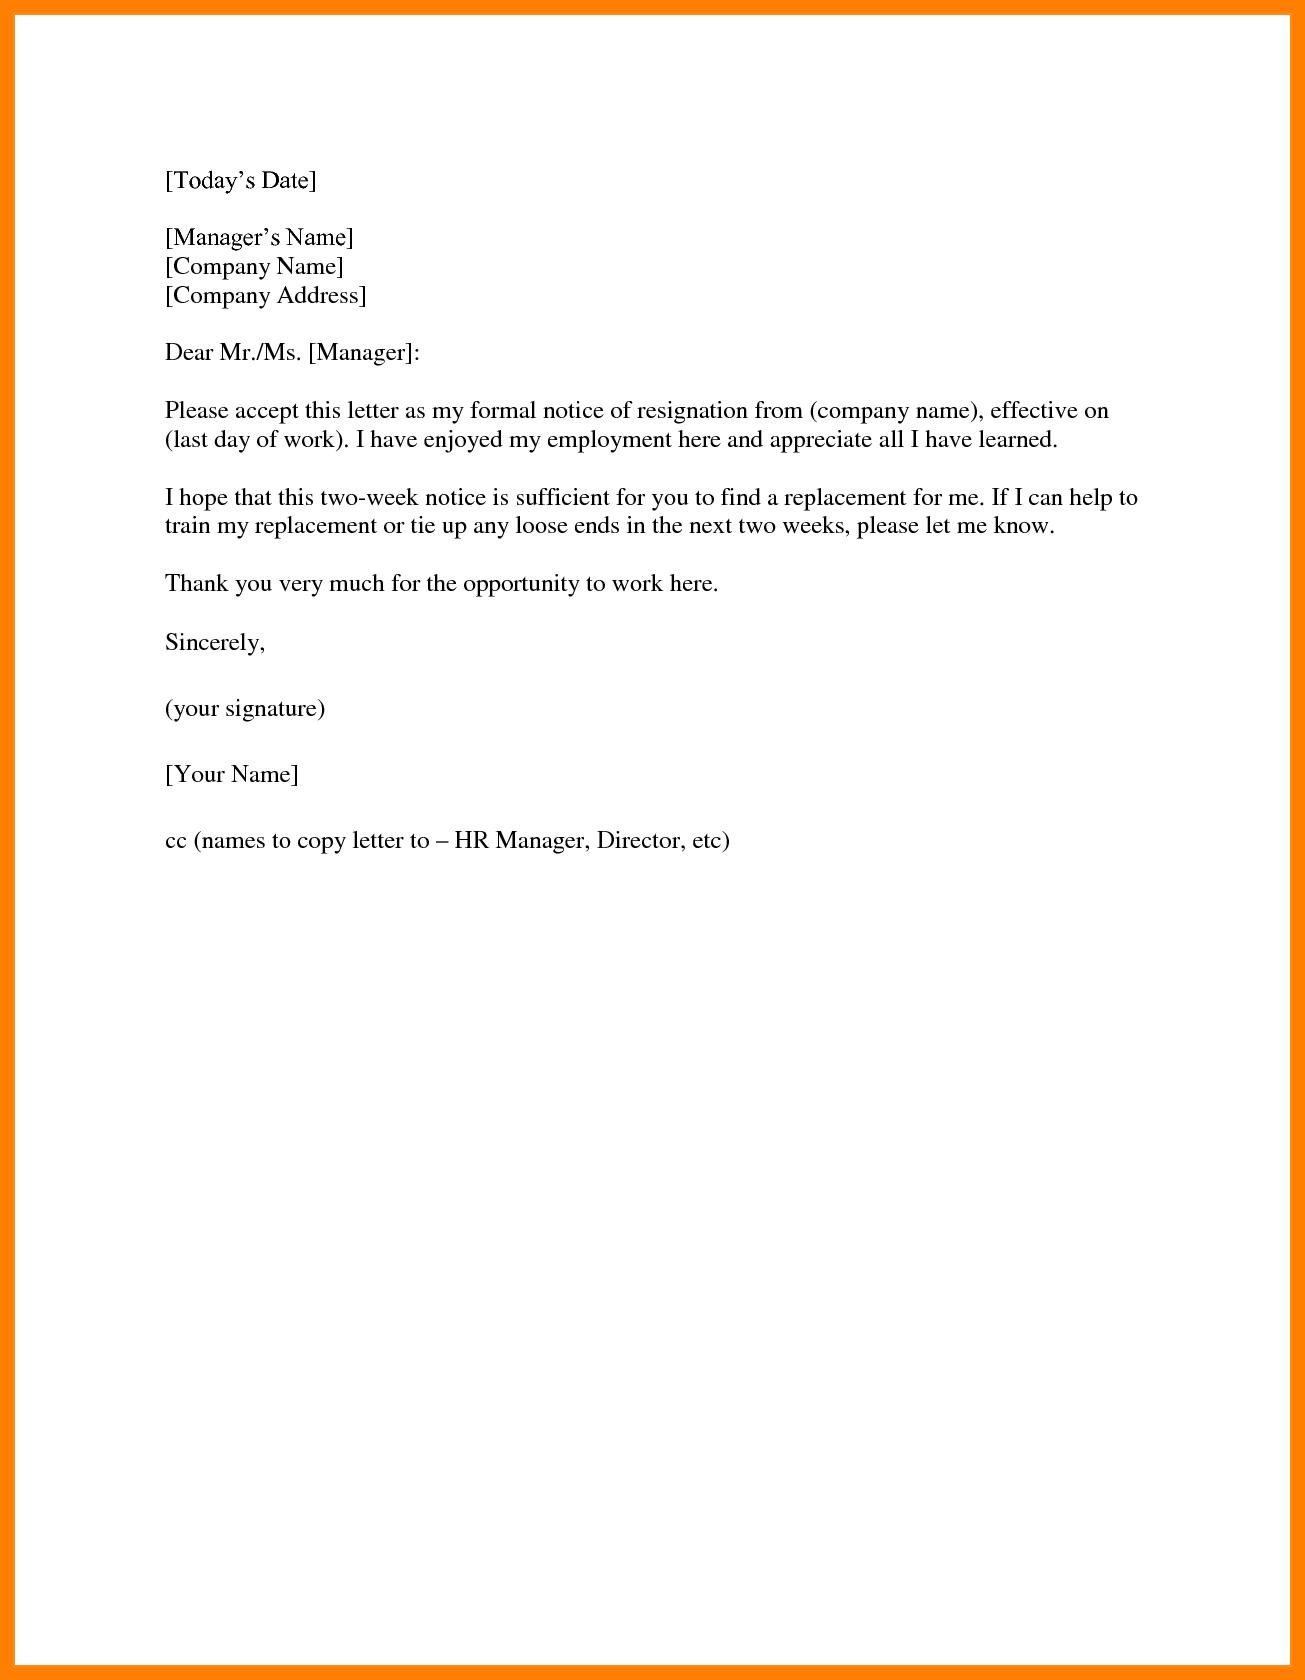 Two Weeks Notice Template Word  Managementoncall With Two Week Notice Template Word